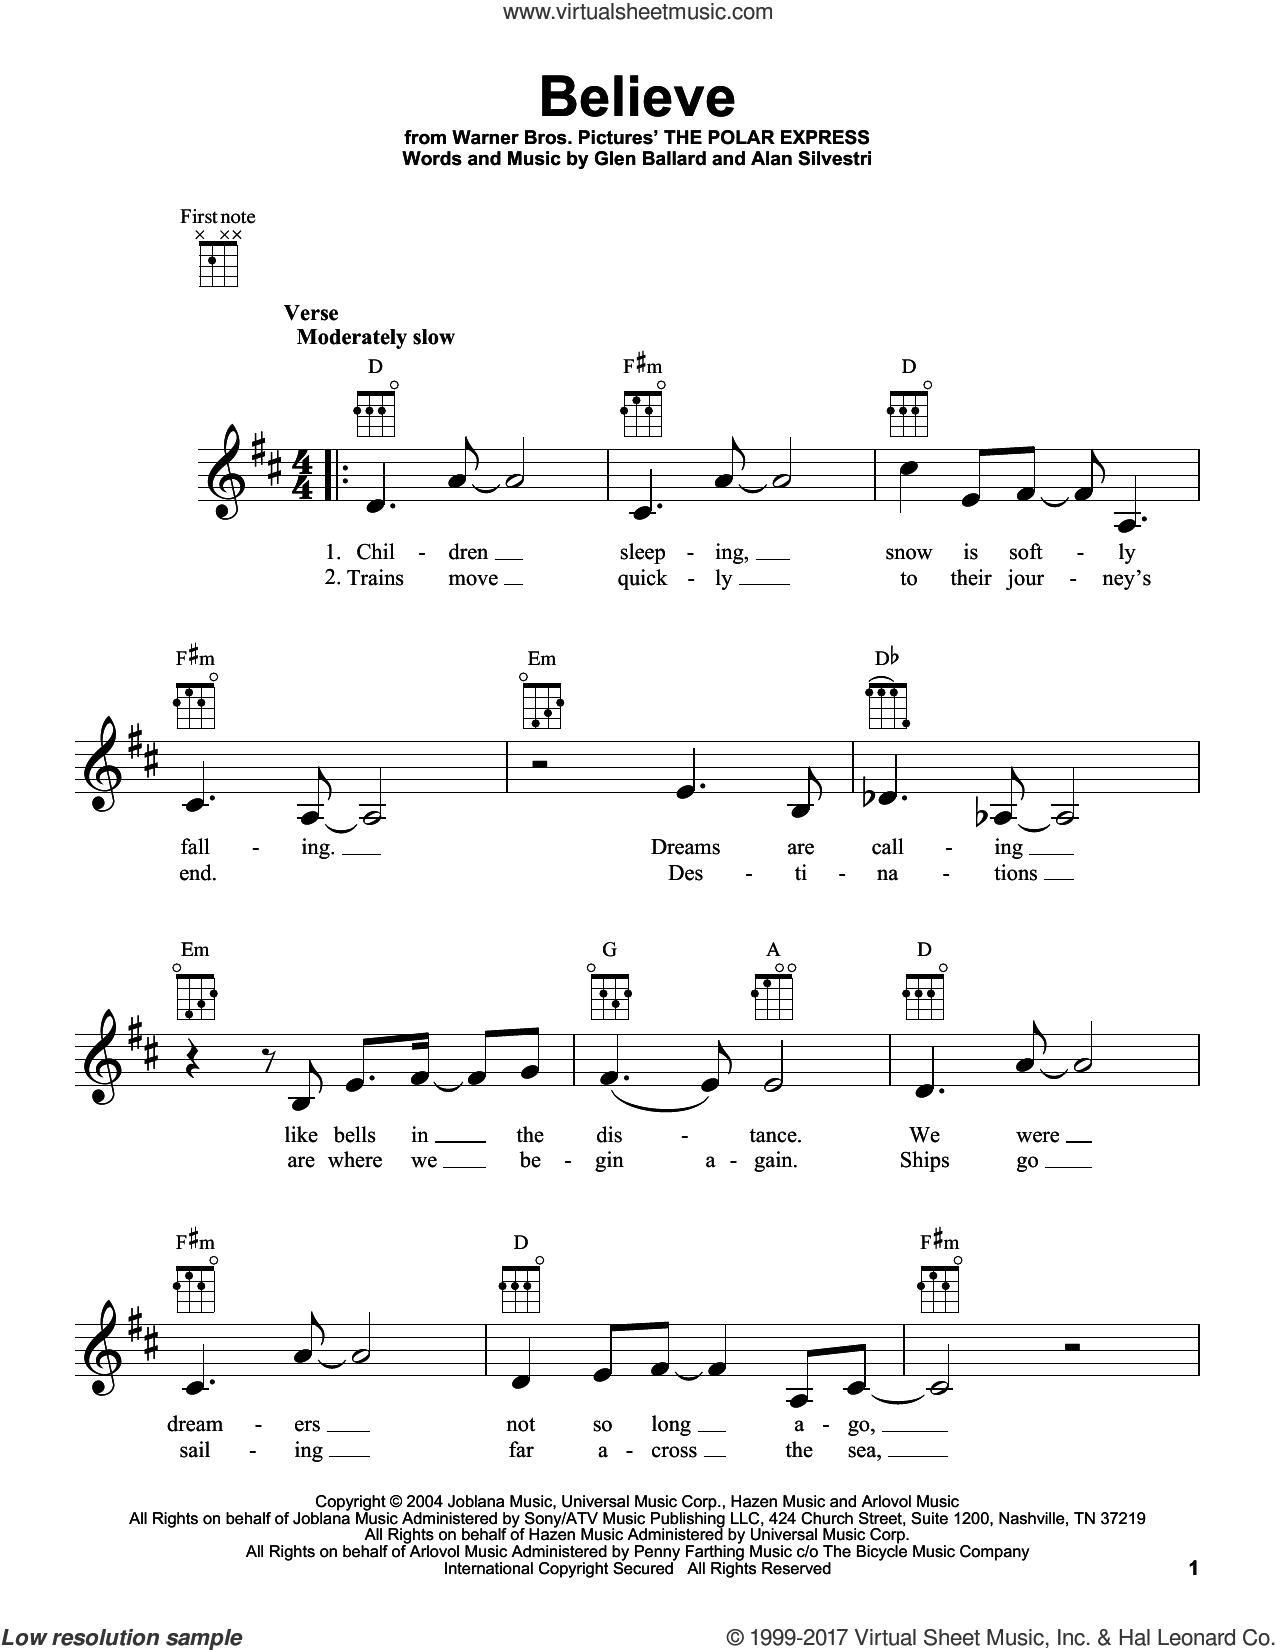 Believe (from The Polar Express) sheet music for ukulele by Josh Groban, Alan Silvestri and Glen Ballard, intermediate skill level